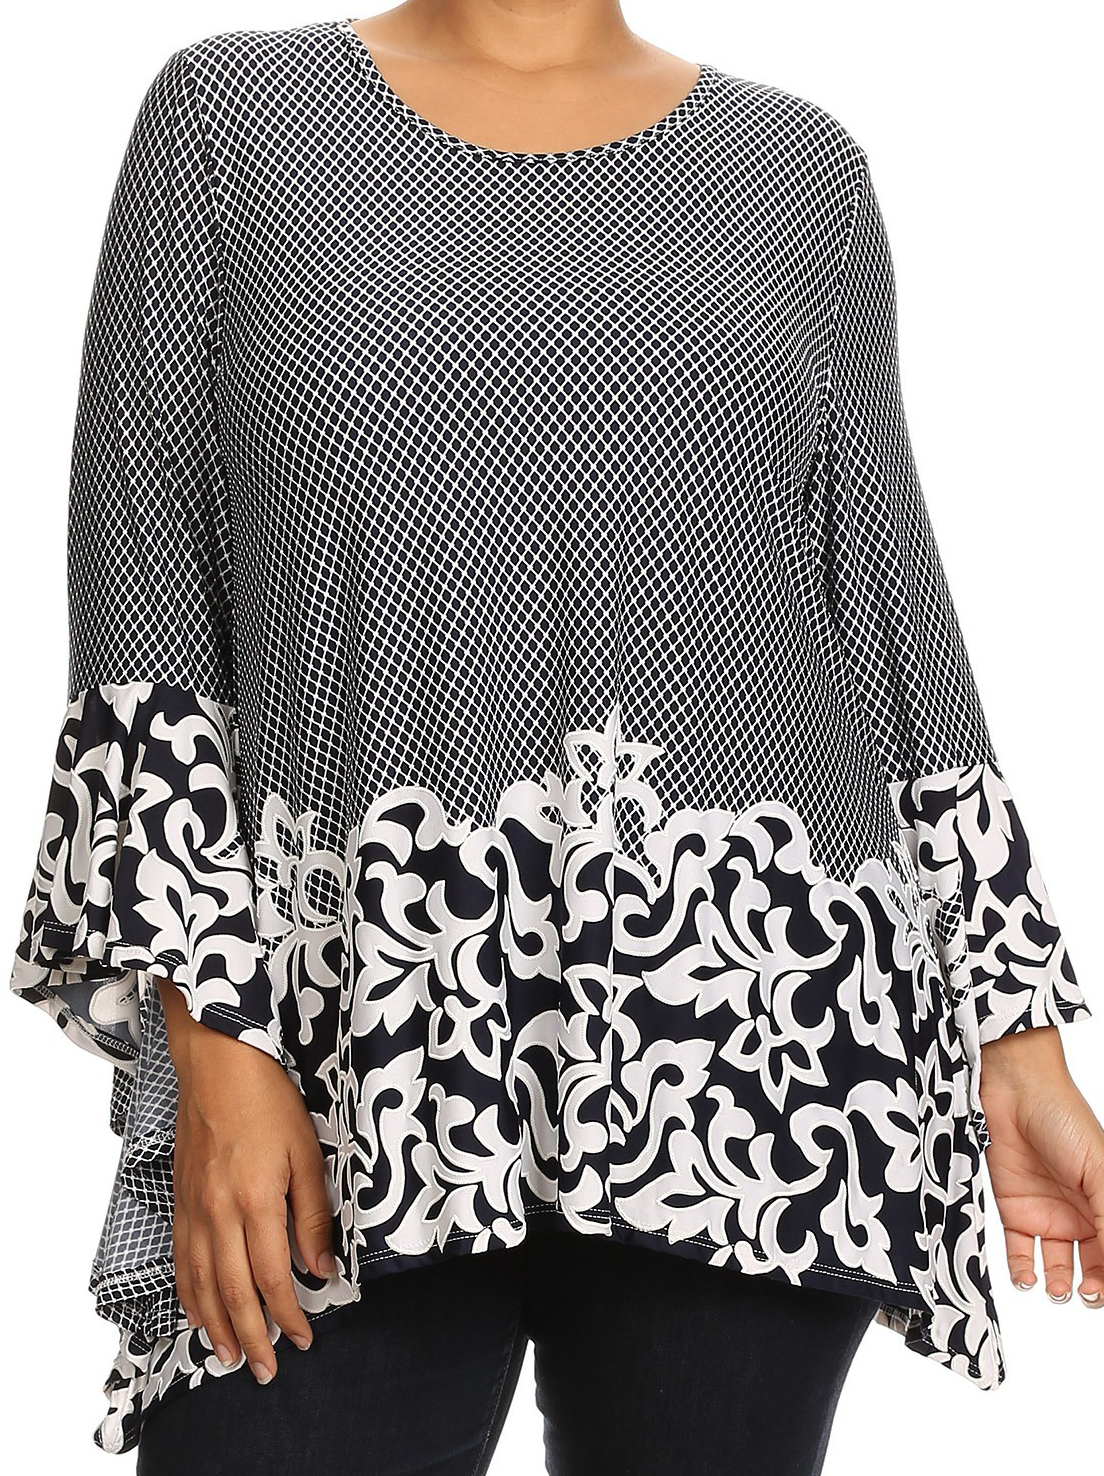 Women Plus Size Abstract Print Kimono Sleeves Tunic Knit Top Tee Shirt Navy Abstract XL B461